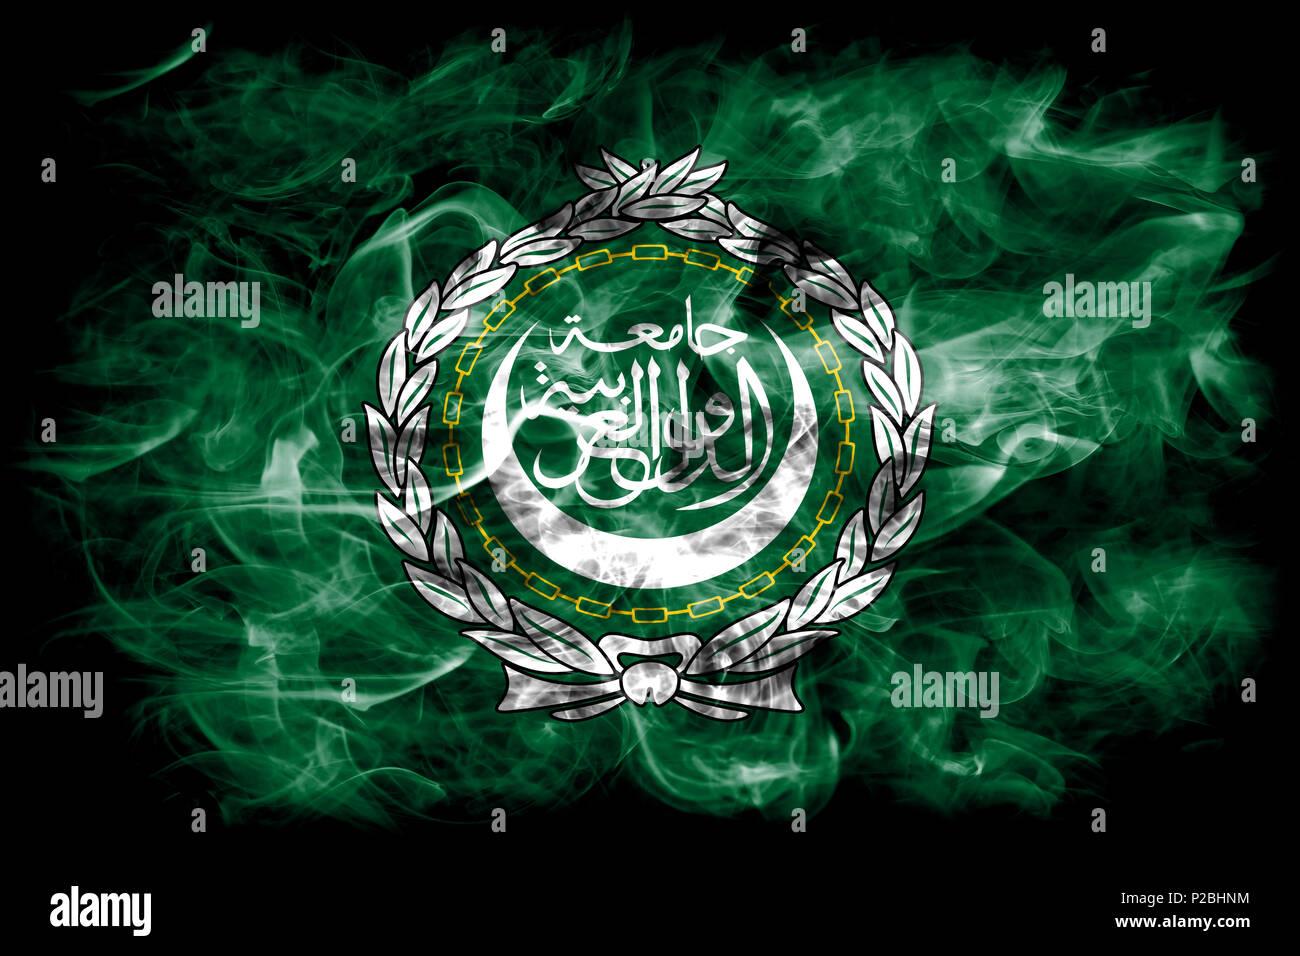 Arab League smoke flag, regional organization of Arab states - Stock Image